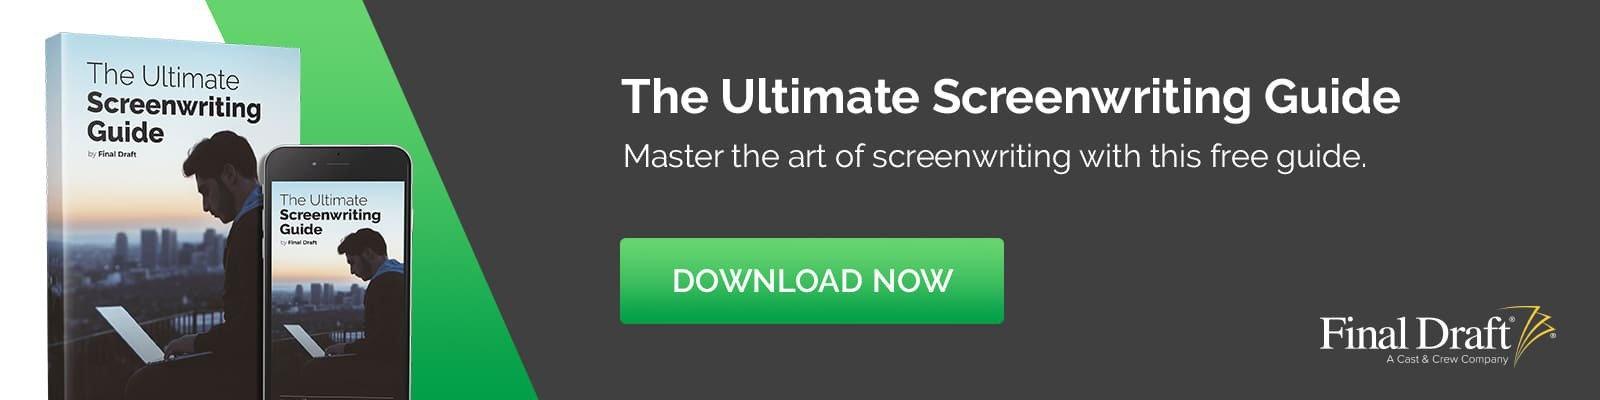 ultimate screenwriting guide_end